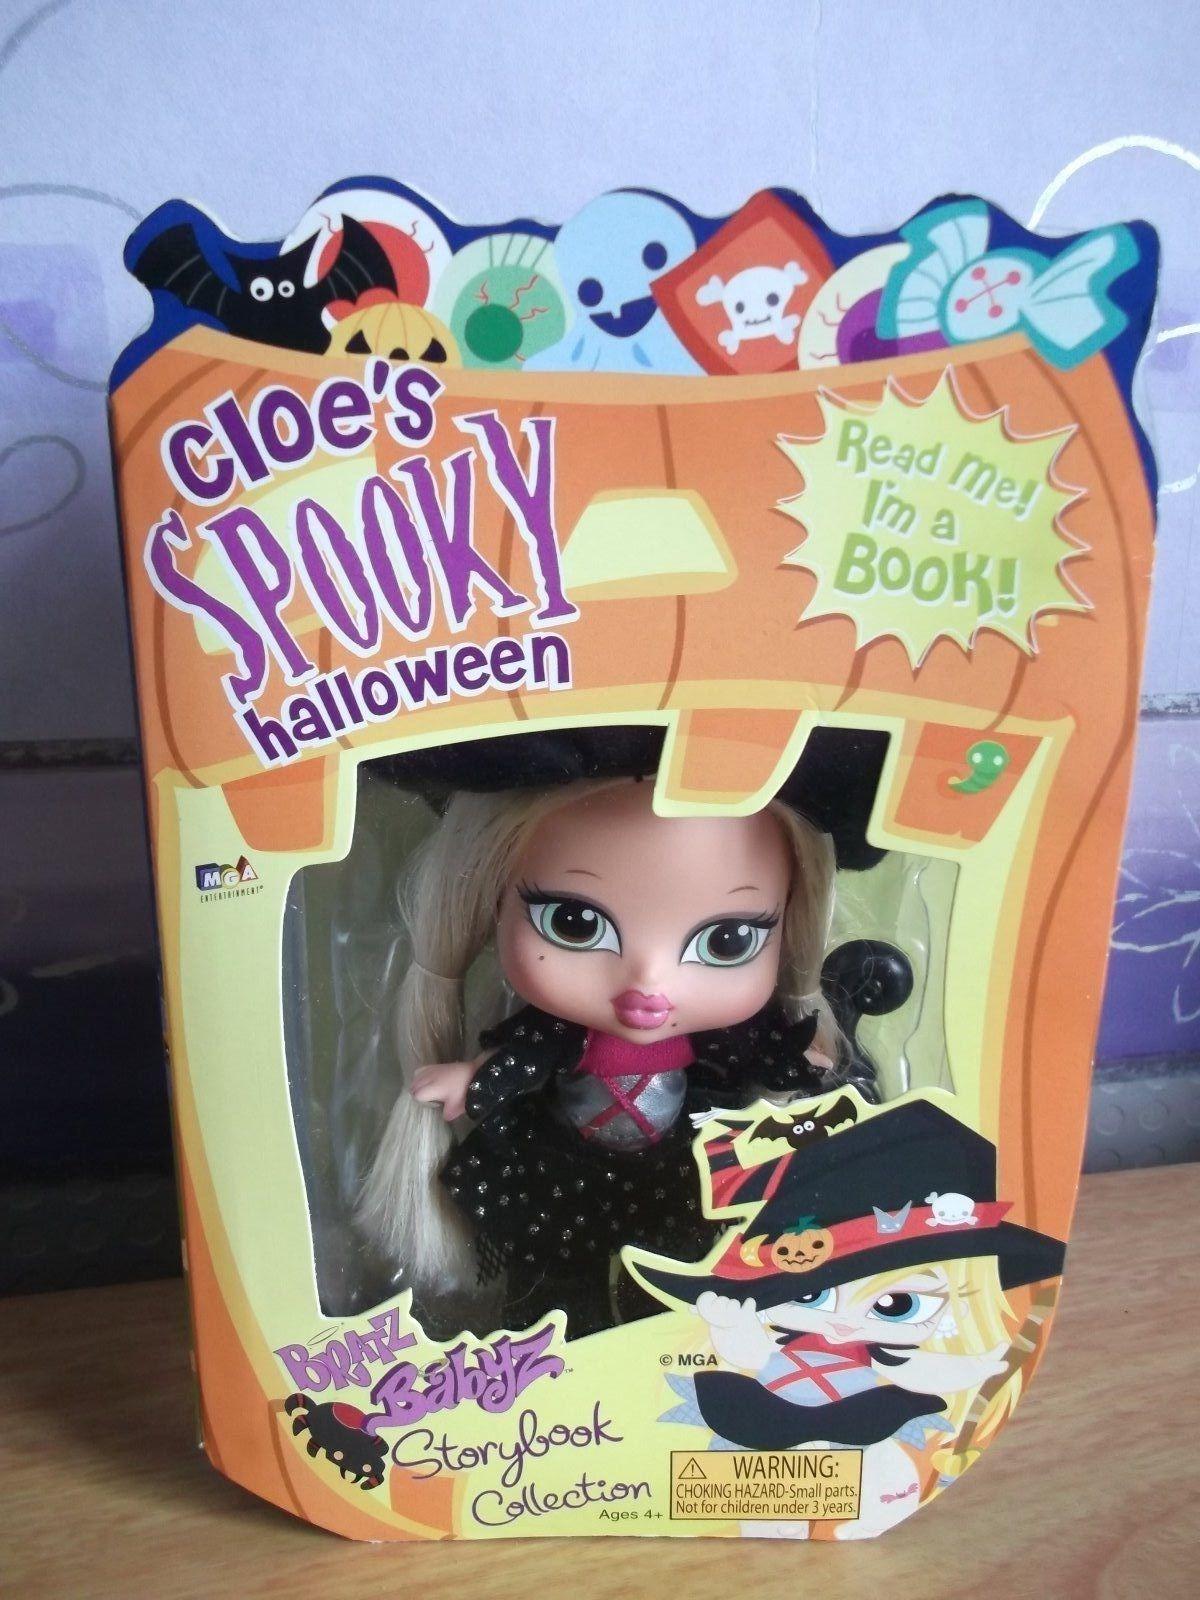 Bratz babyz storybook collection doll Cloe s spooky halloween New